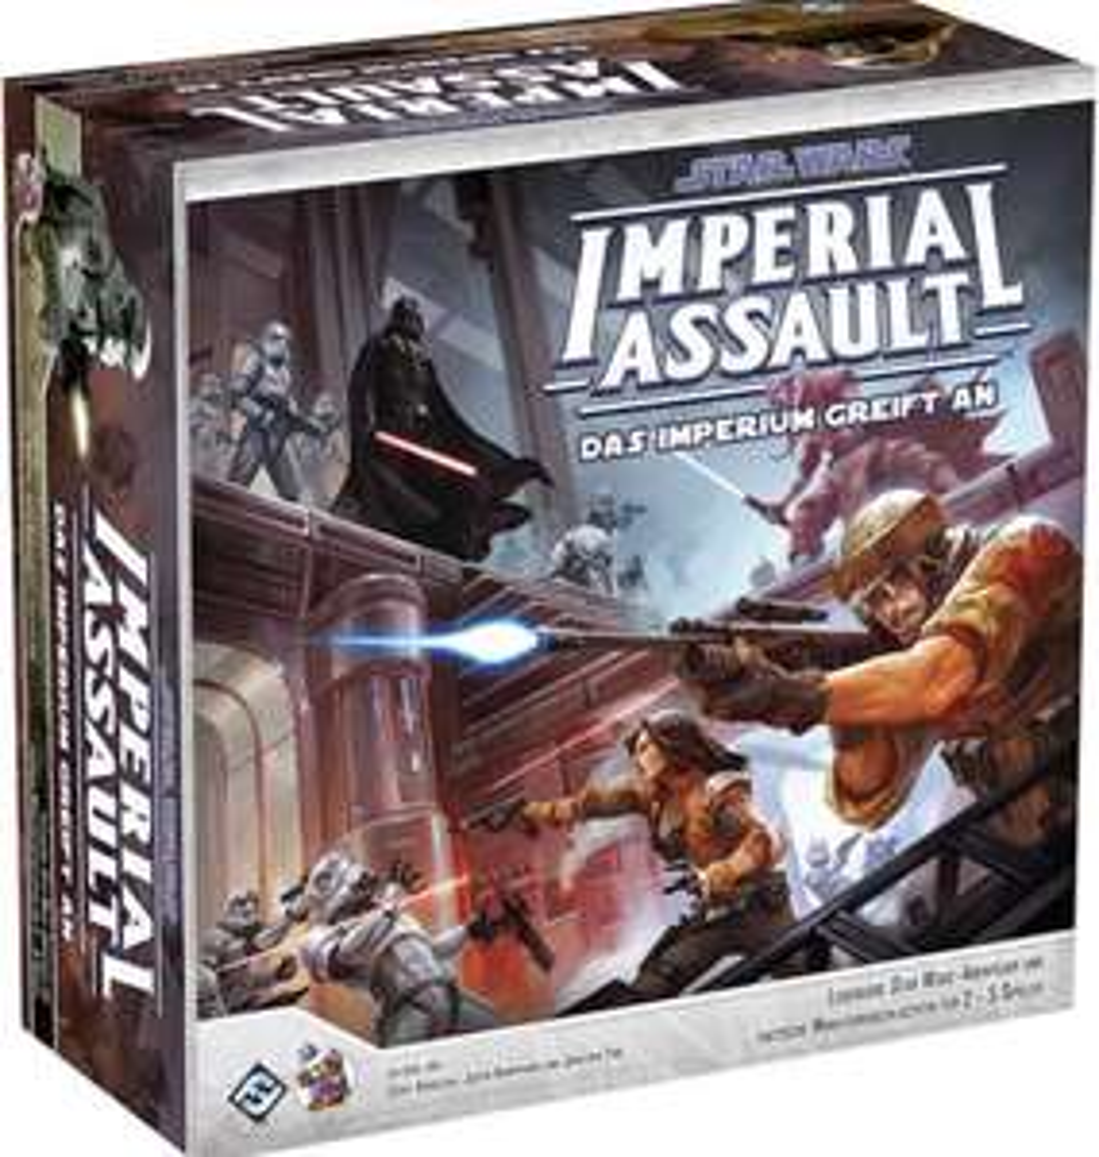 Brettspiel : Star Wars Imperial Assault